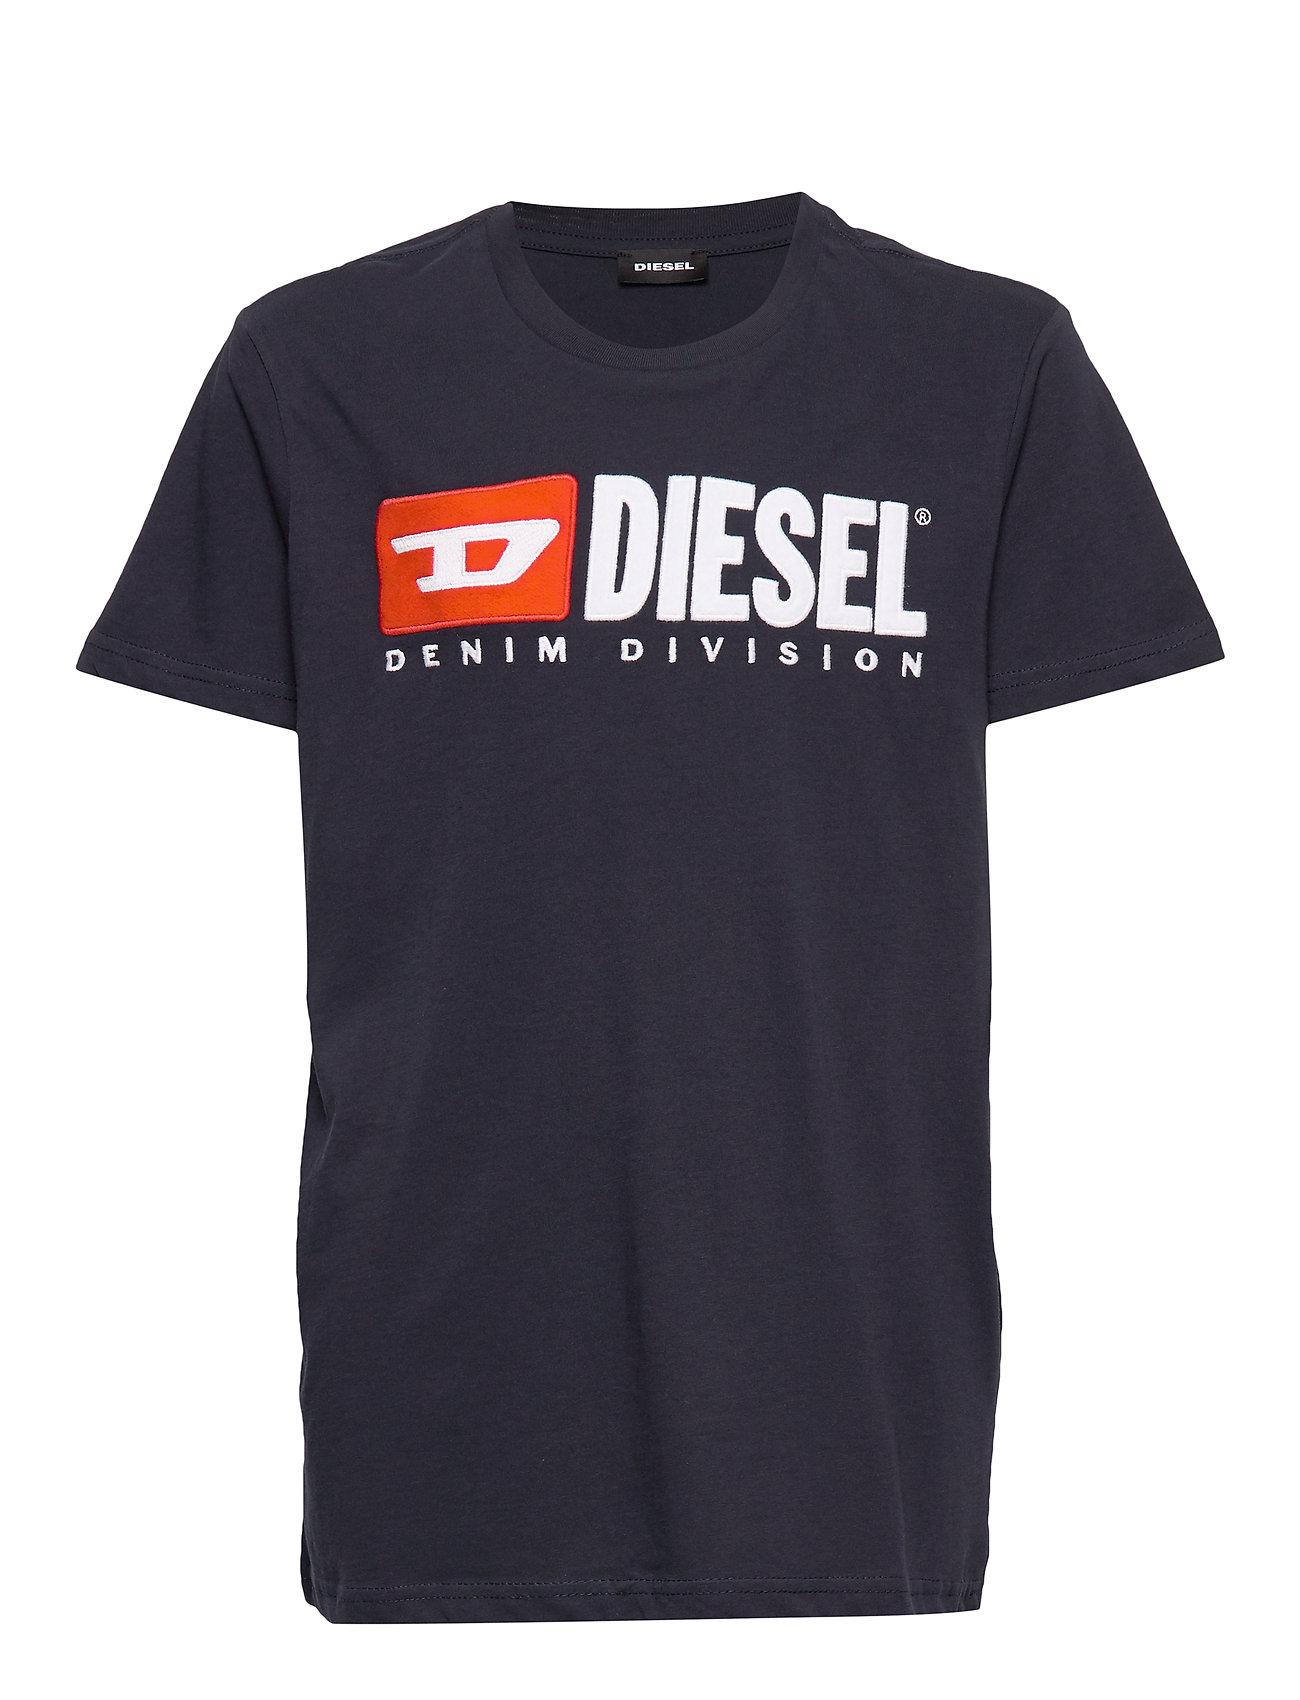 Diesel TJUSTDIVISION T-SHIRT - DARK BLUE